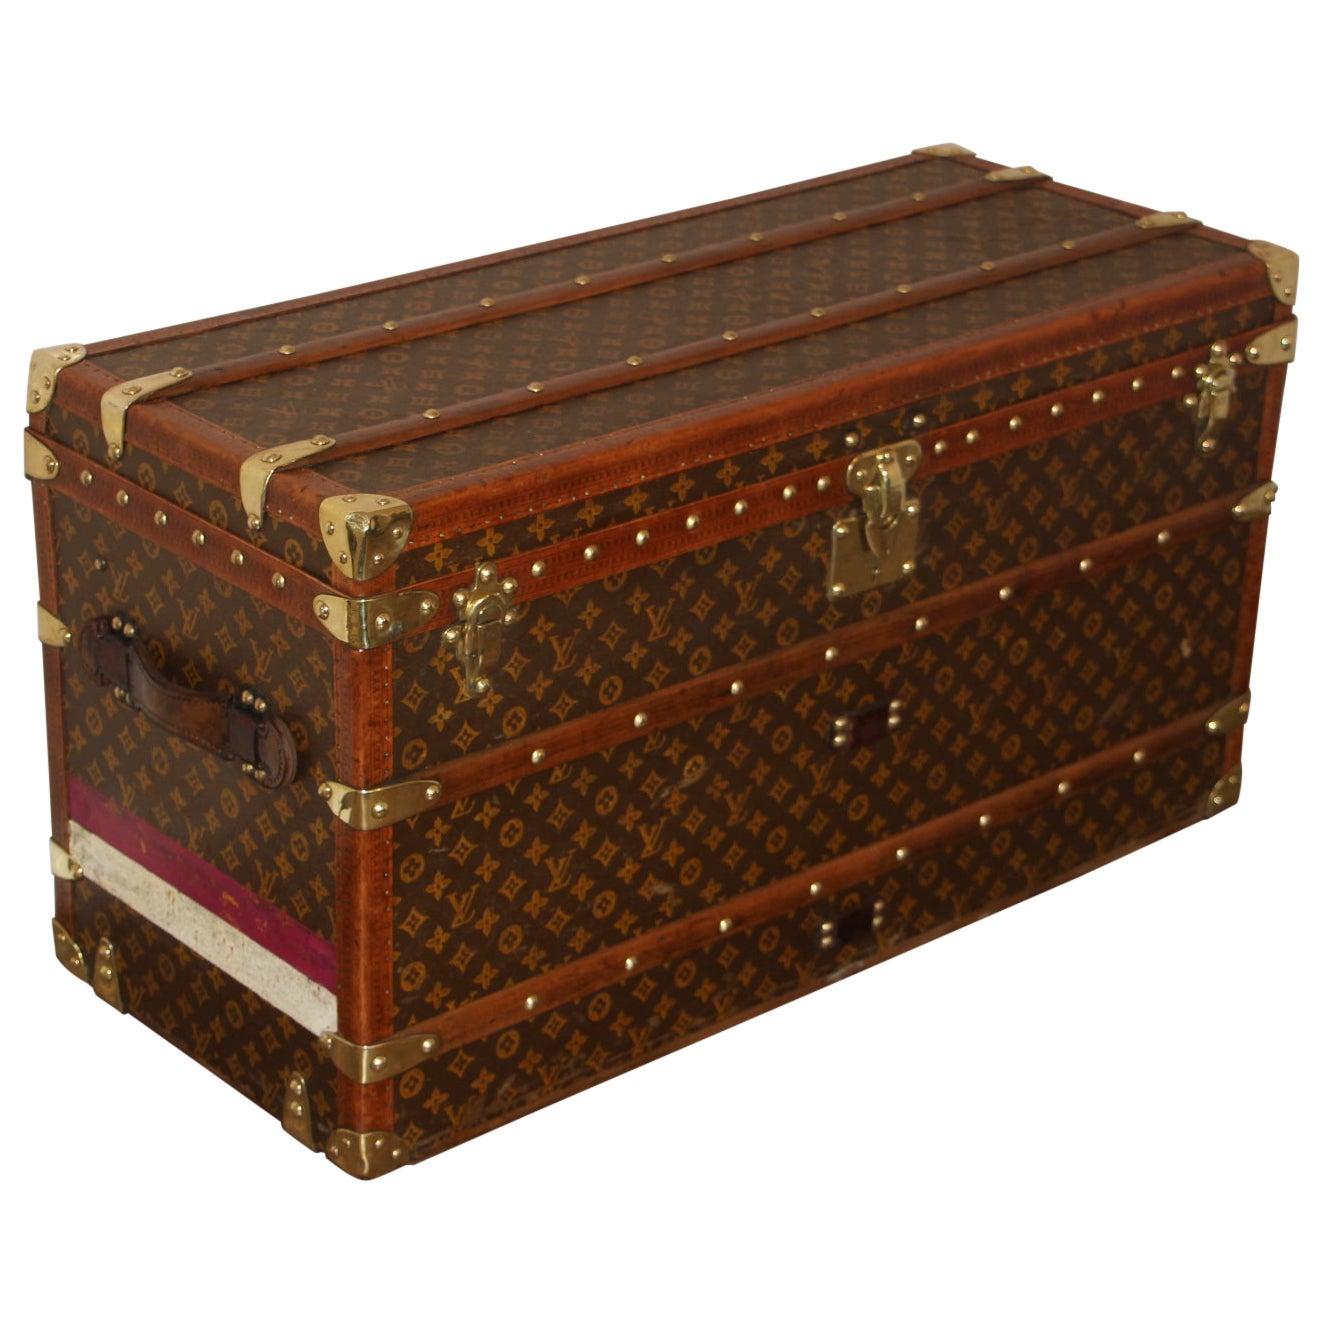 Louis Vuitton Shoe Trunk, Louis Vuitton Trunk, Louis Vuitton Steamer Trunk